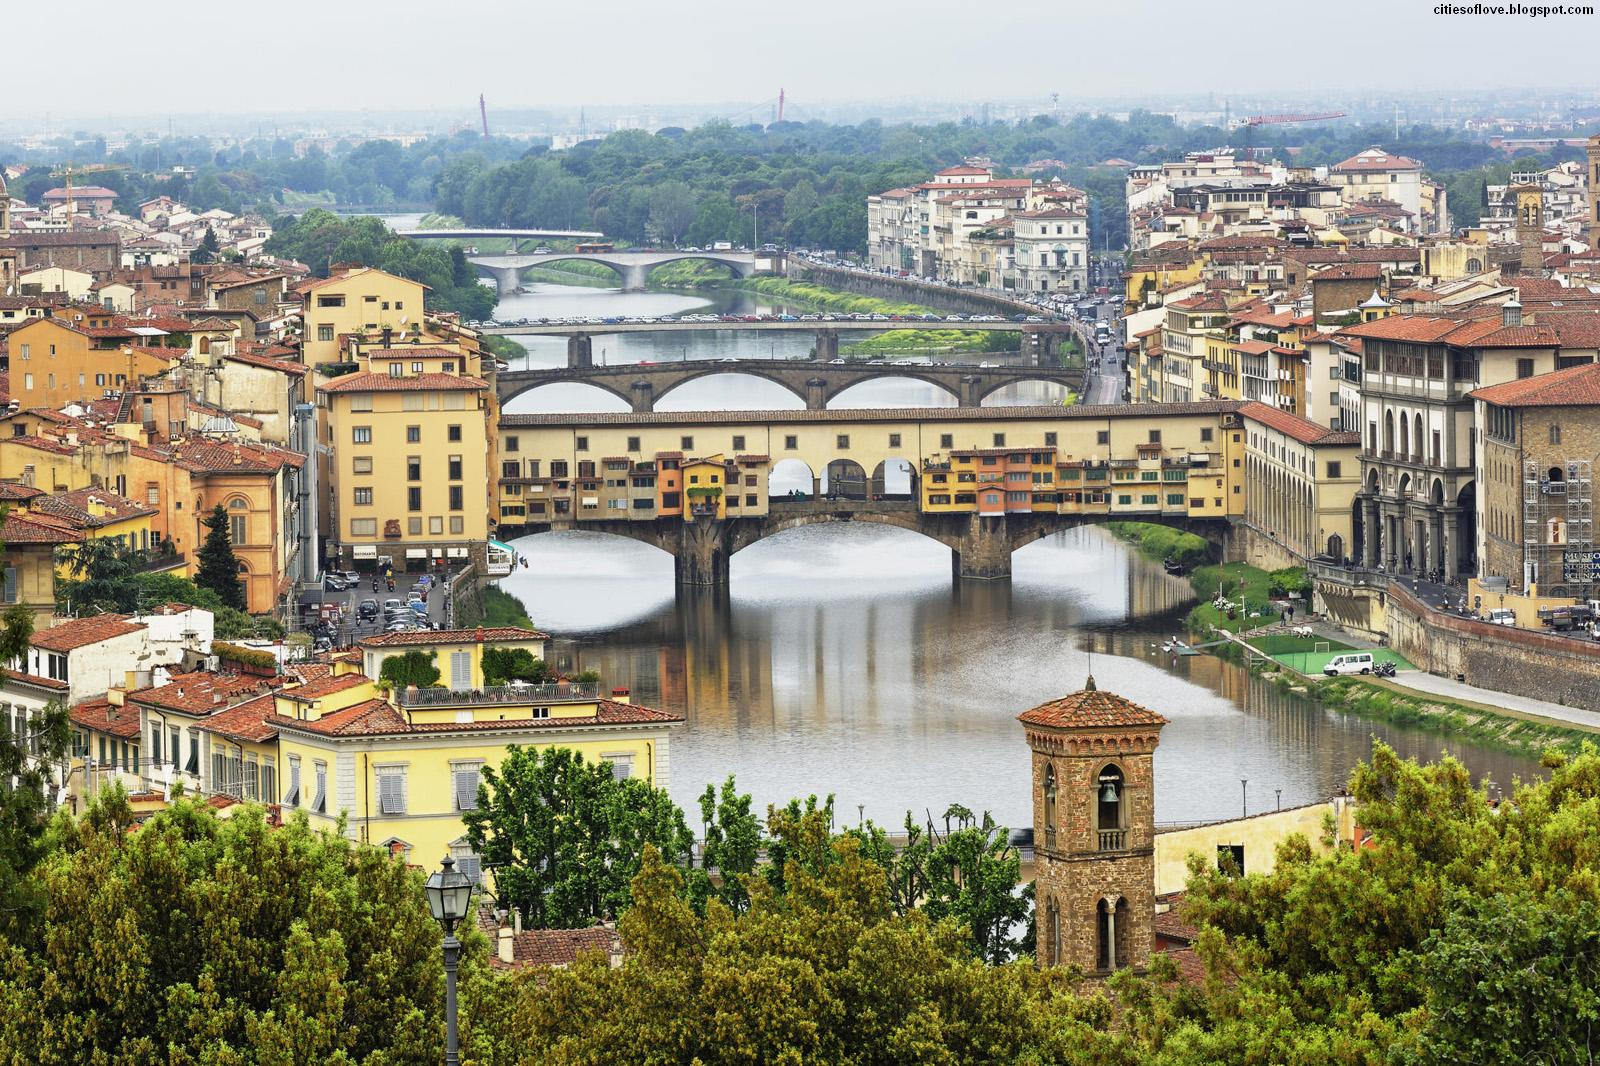 Italian Old Bridge Arno River Italy Hd Desktop Wallpaper Image Gallery 1600x1066